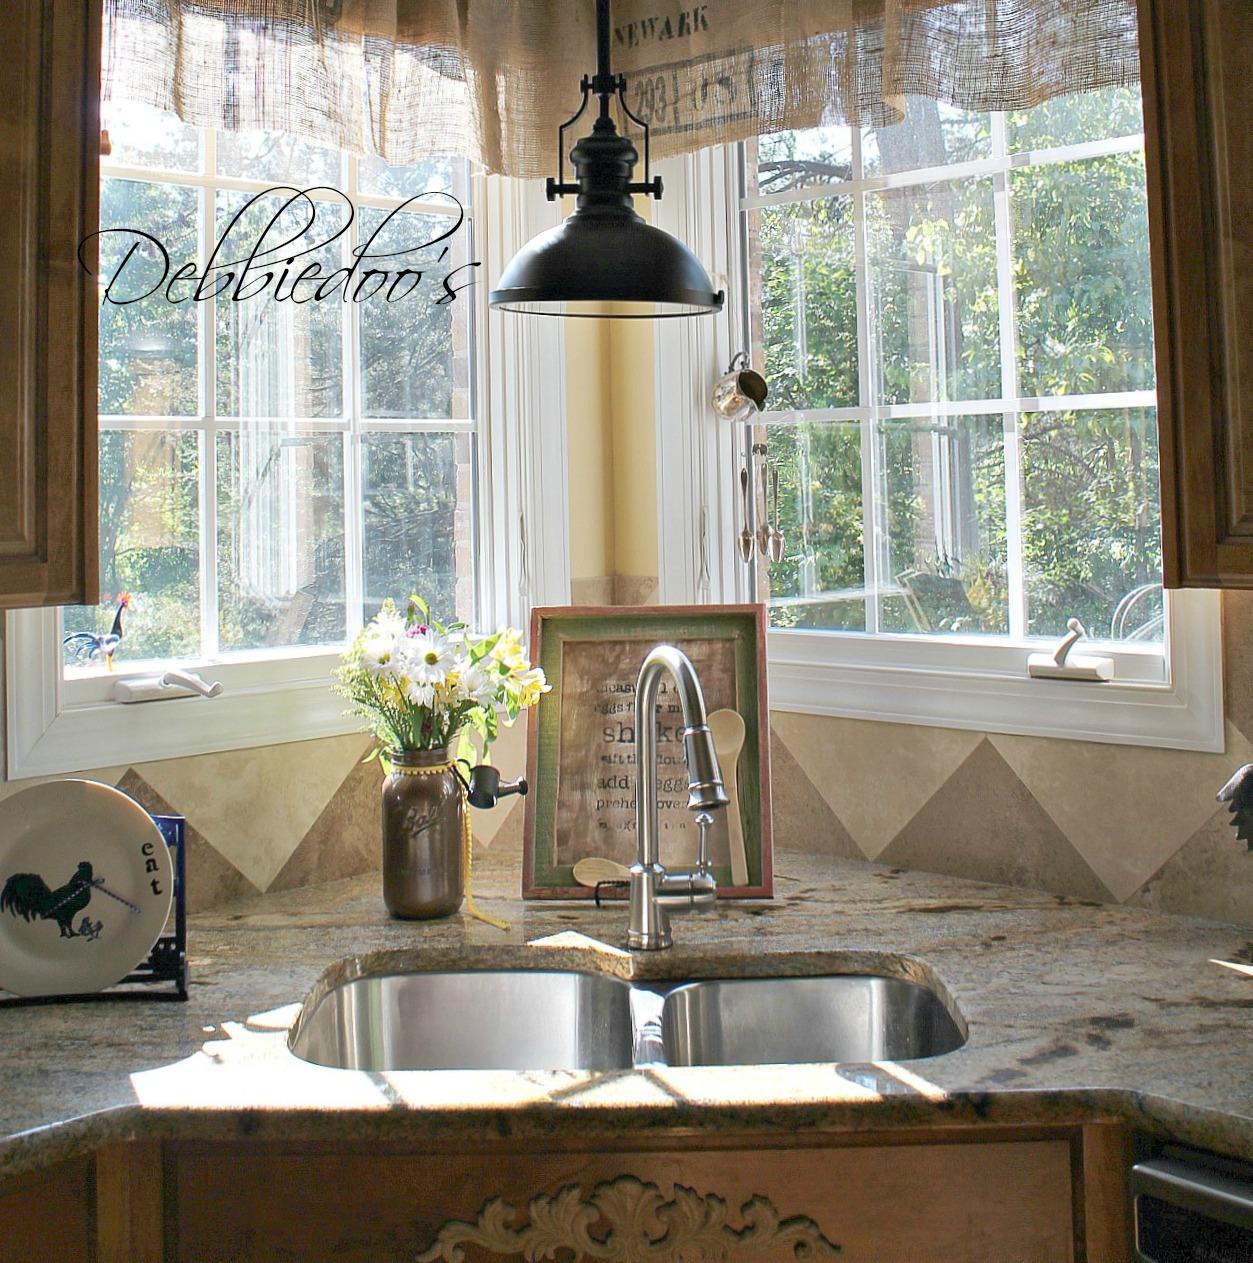 sunny mason jar in window 001